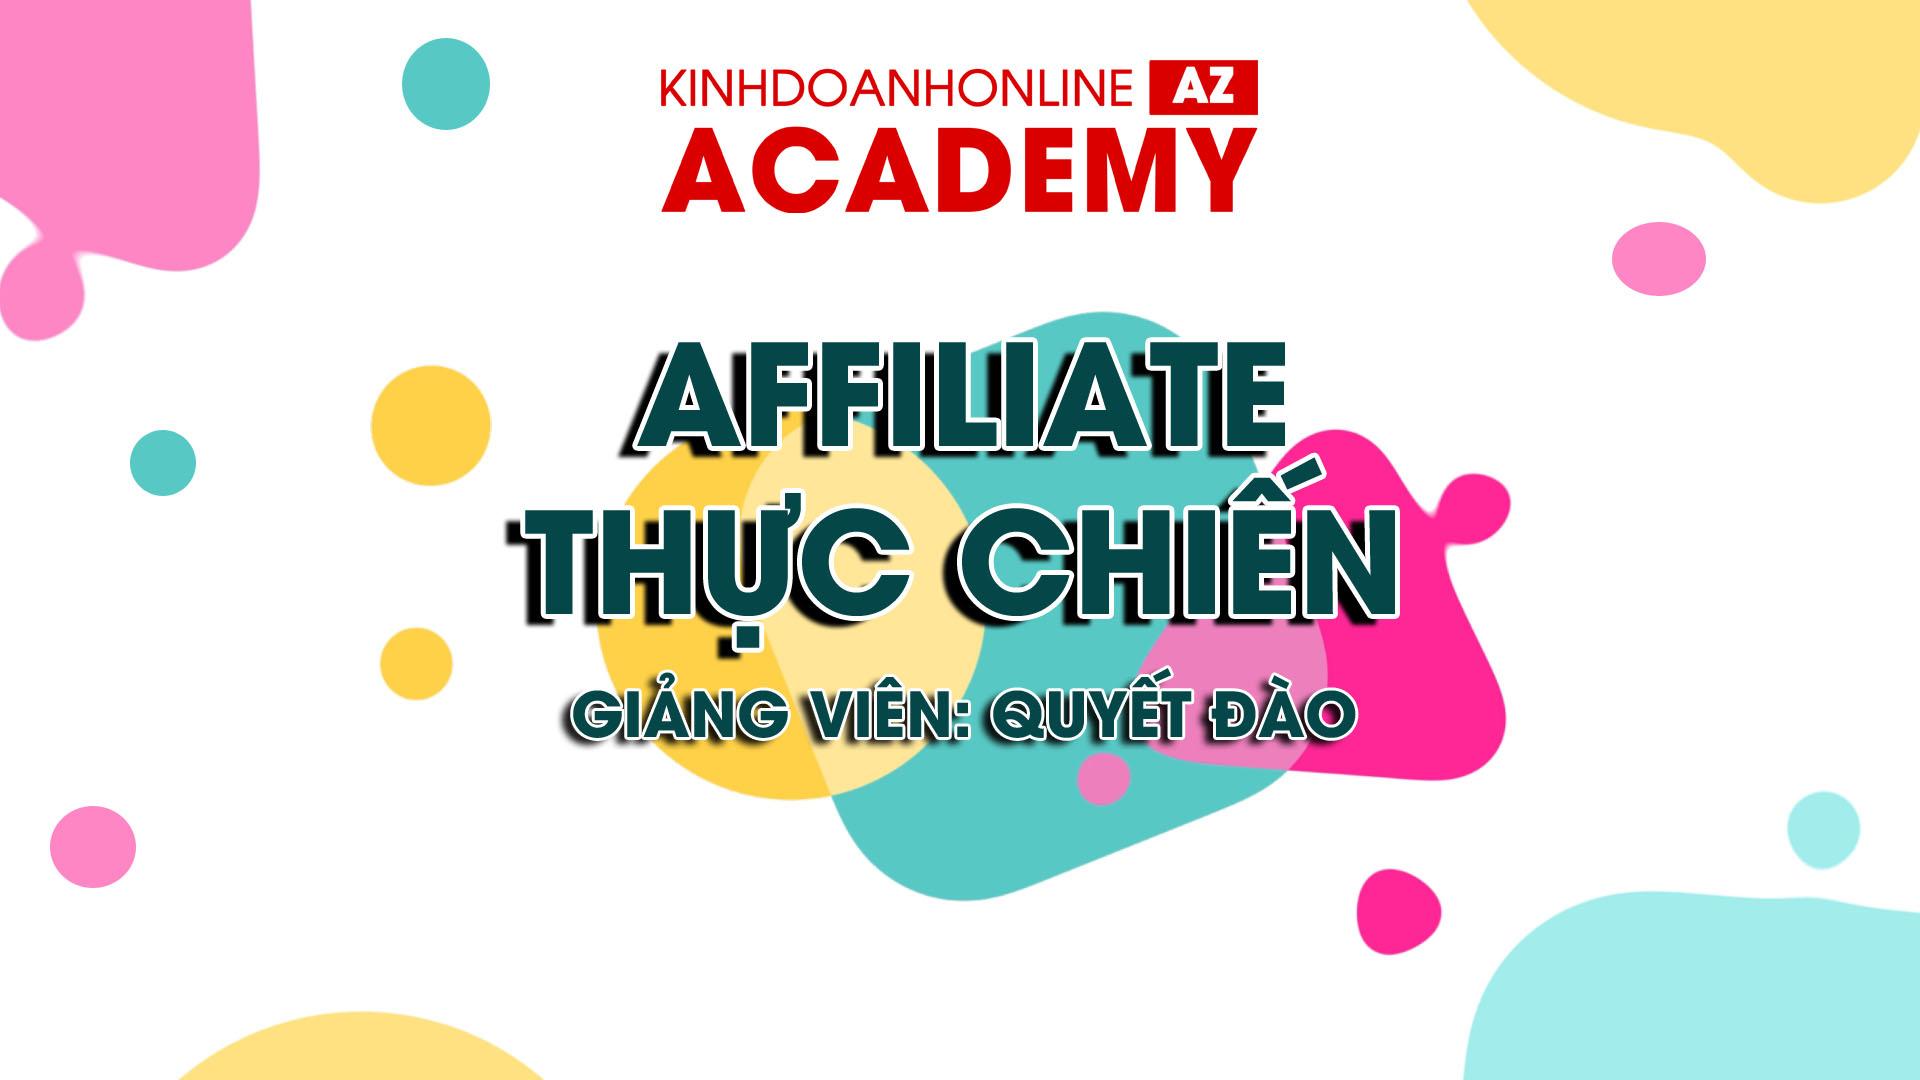 affiliate-thuc-chien-giang-vien-quyet-dao-hd